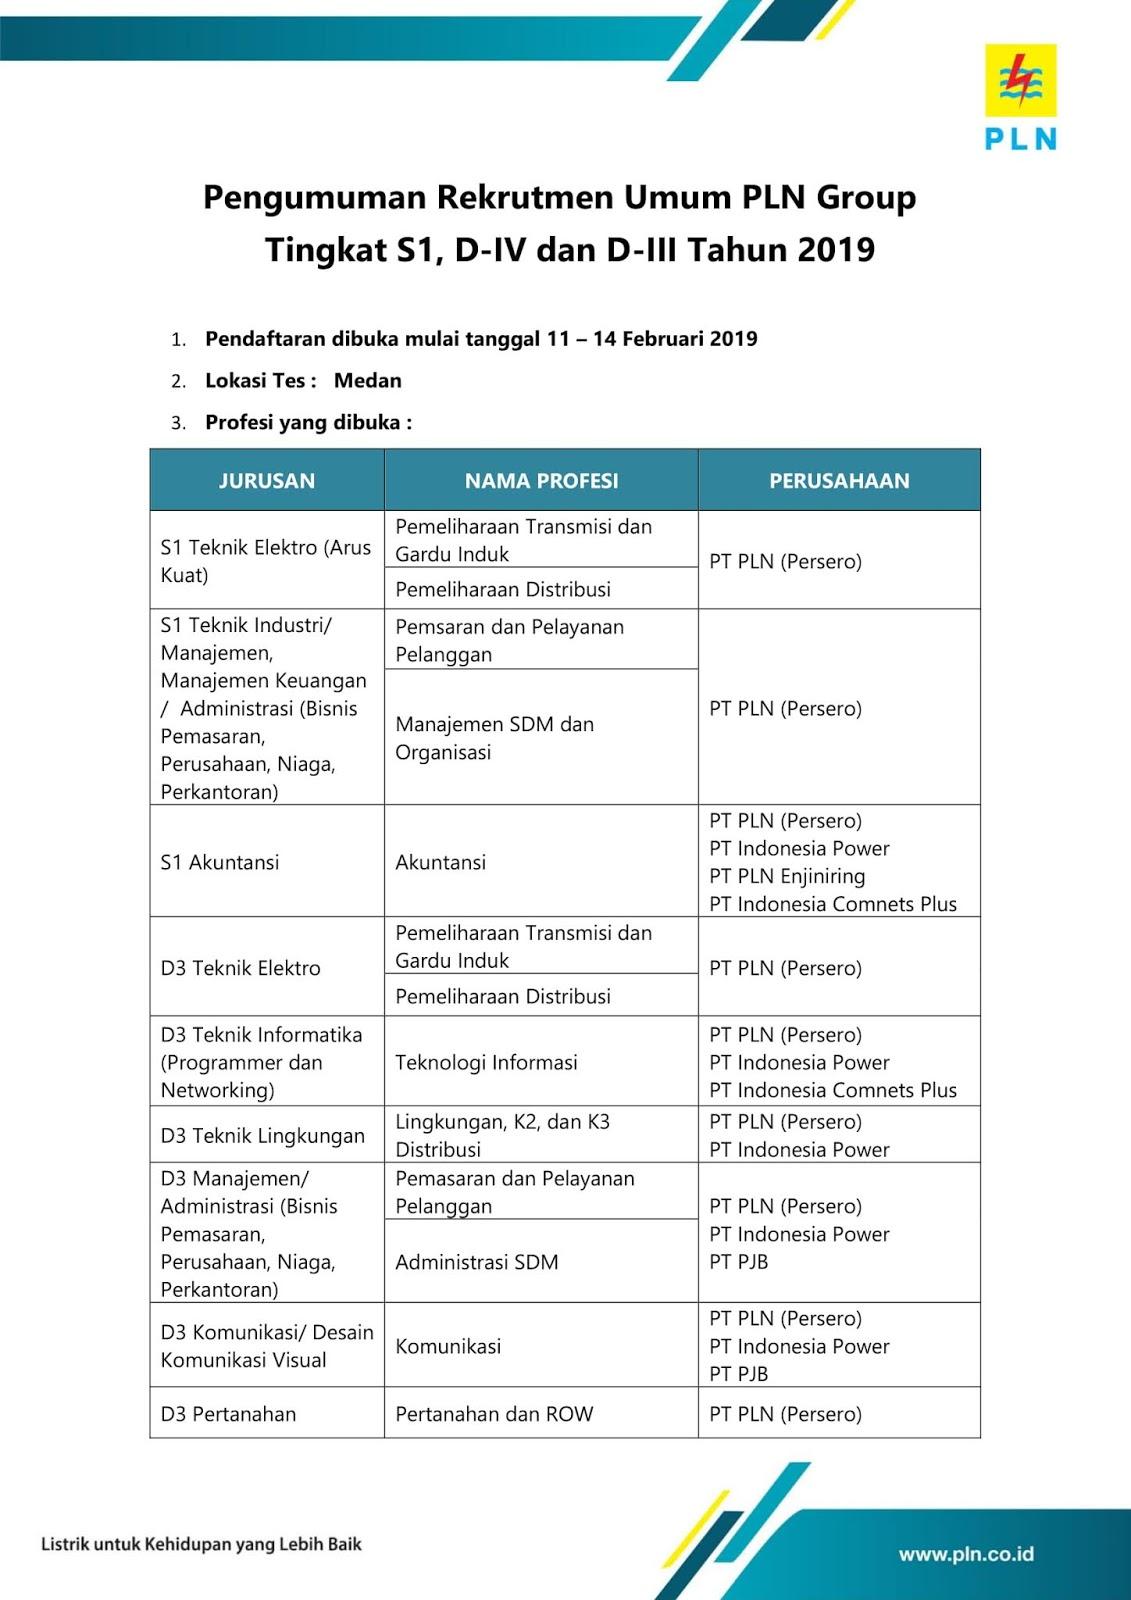 Rekrutmen PLN Group Wilayah Medan, Surabaya, Yogyakarta, Bandung Tingkat S1 D4 D3 Tahun 2019